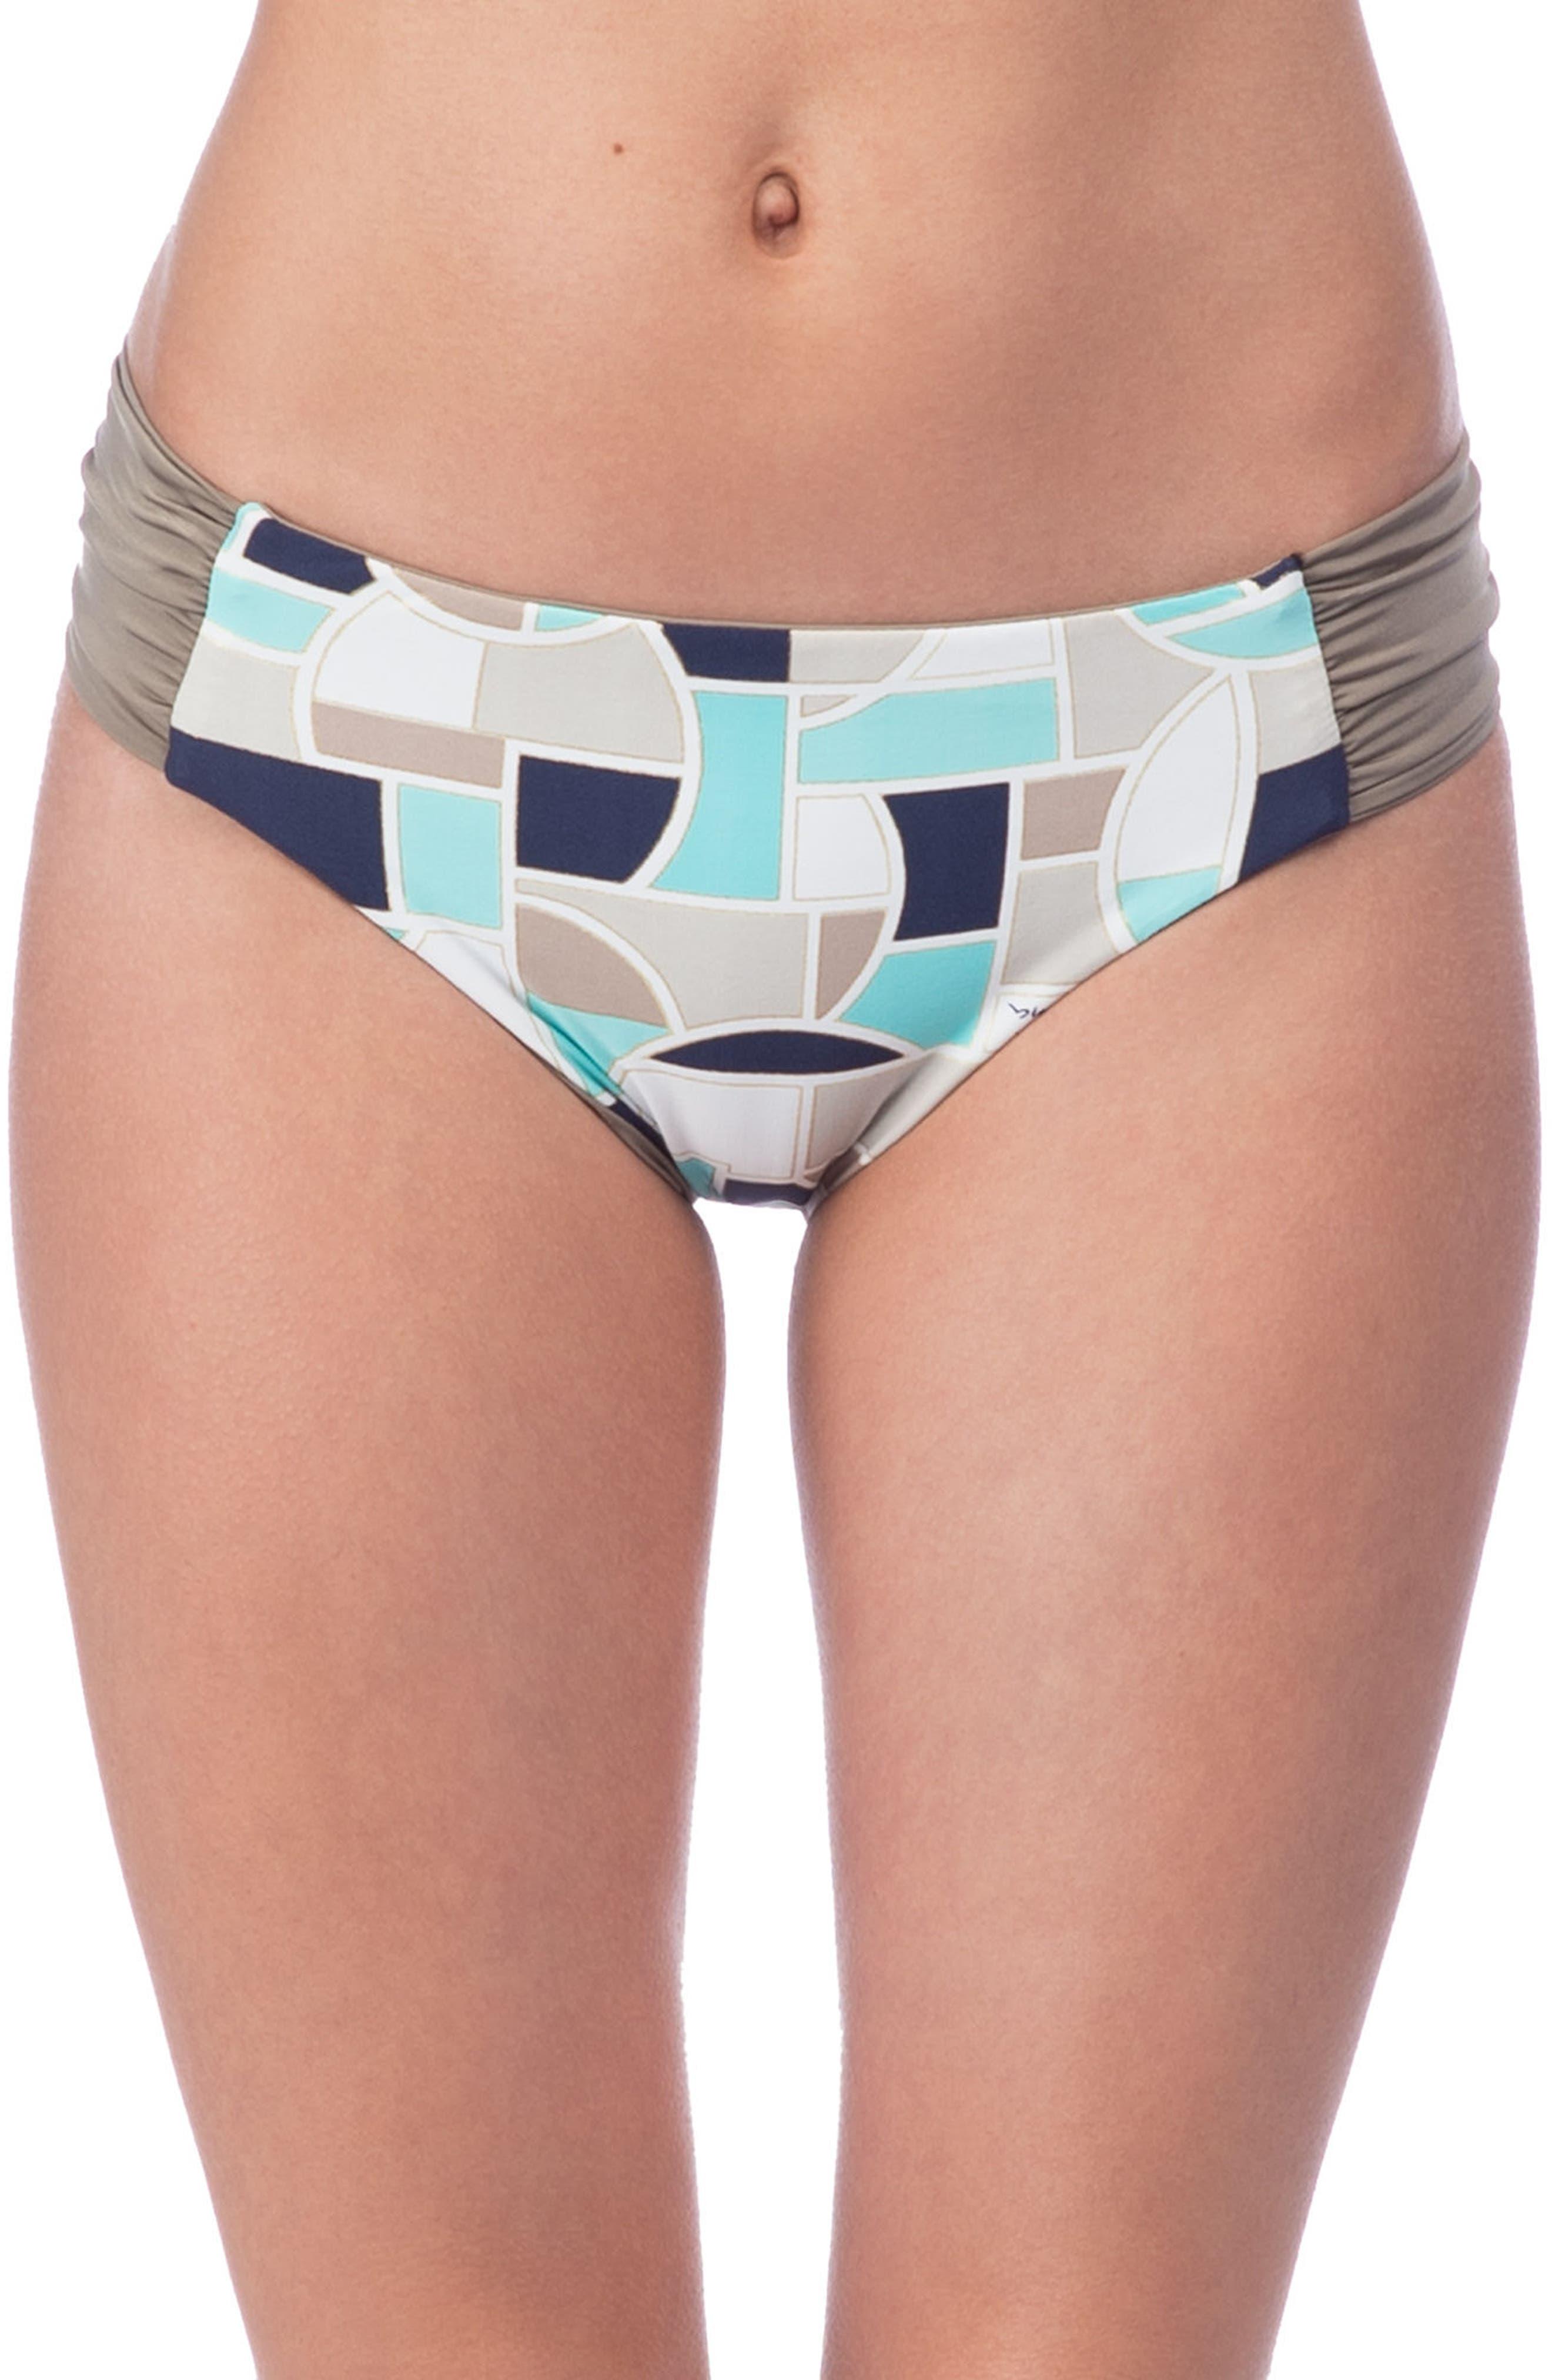 Trina Turk Disco Deco Reversible Bikini Bottoms